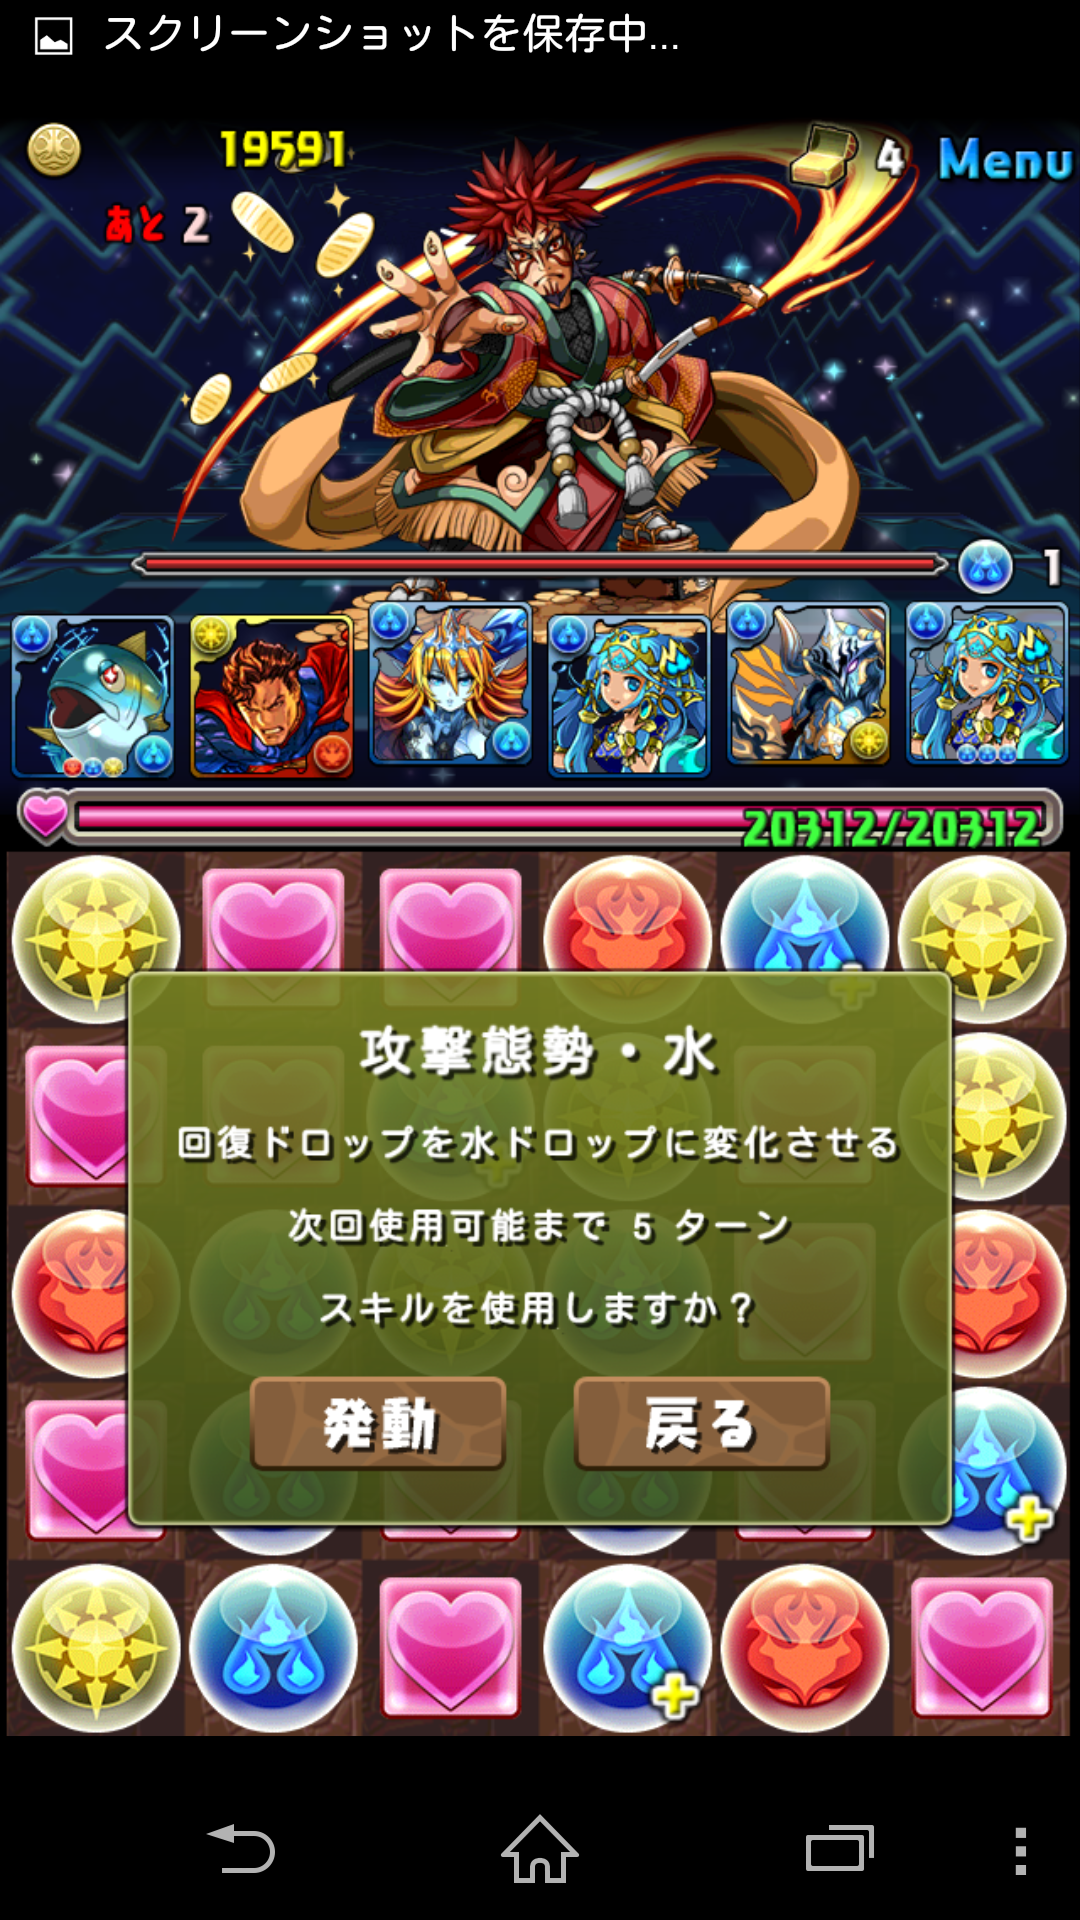 Screenshot_2014-12-16-03-57-17.png